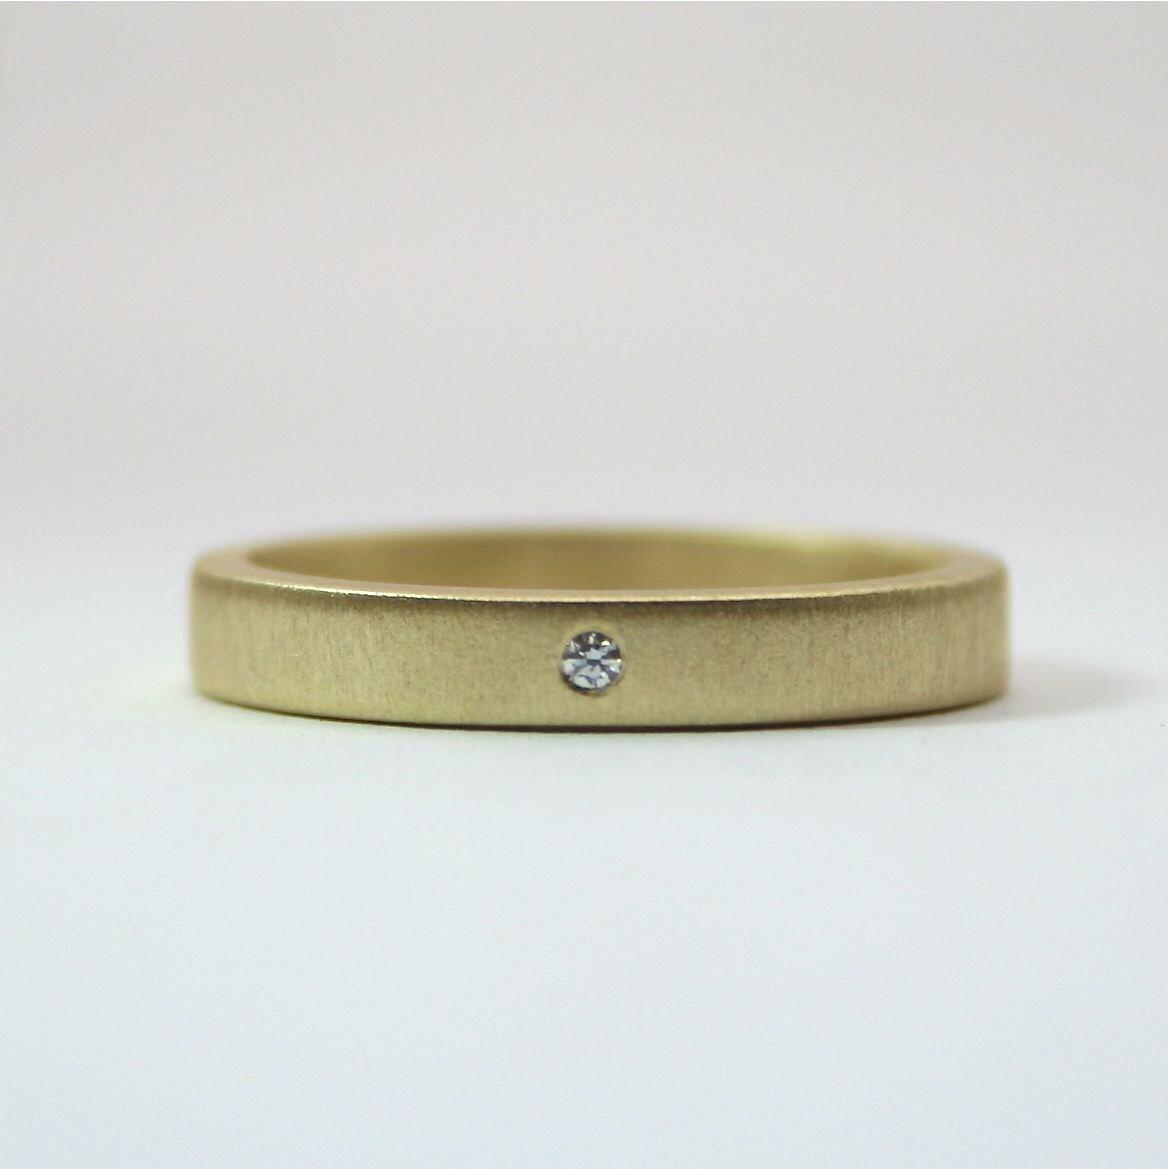 18 Karat Yellow Gold Tiny Diamond Ring 3 mm Matte Finish